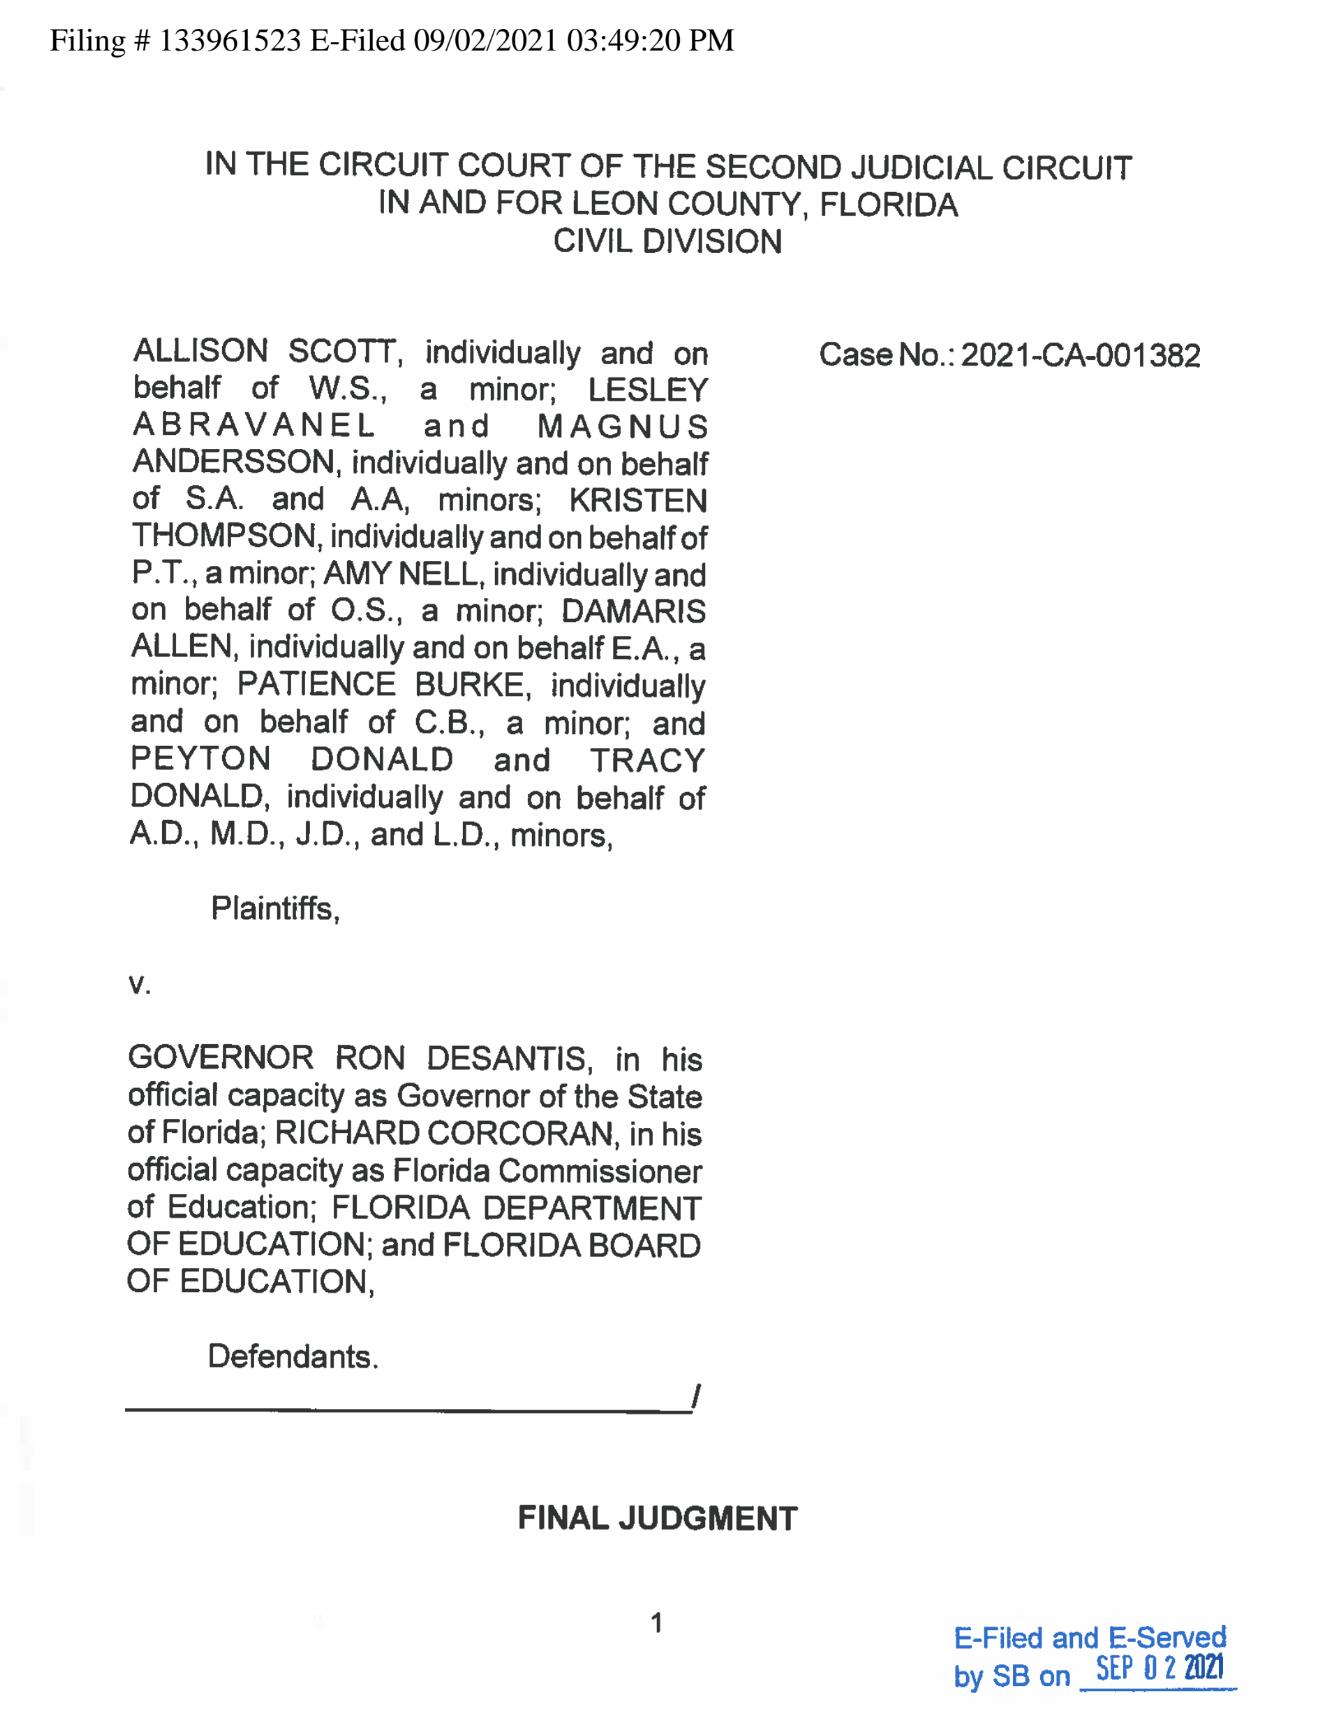 Screen-Shot-2021-09-08-at-1.12.04-PM Florida Judge Strikes Down Ron DeSantis' COVID Restrictions Coronavirus Education Featured Politics Top Stories